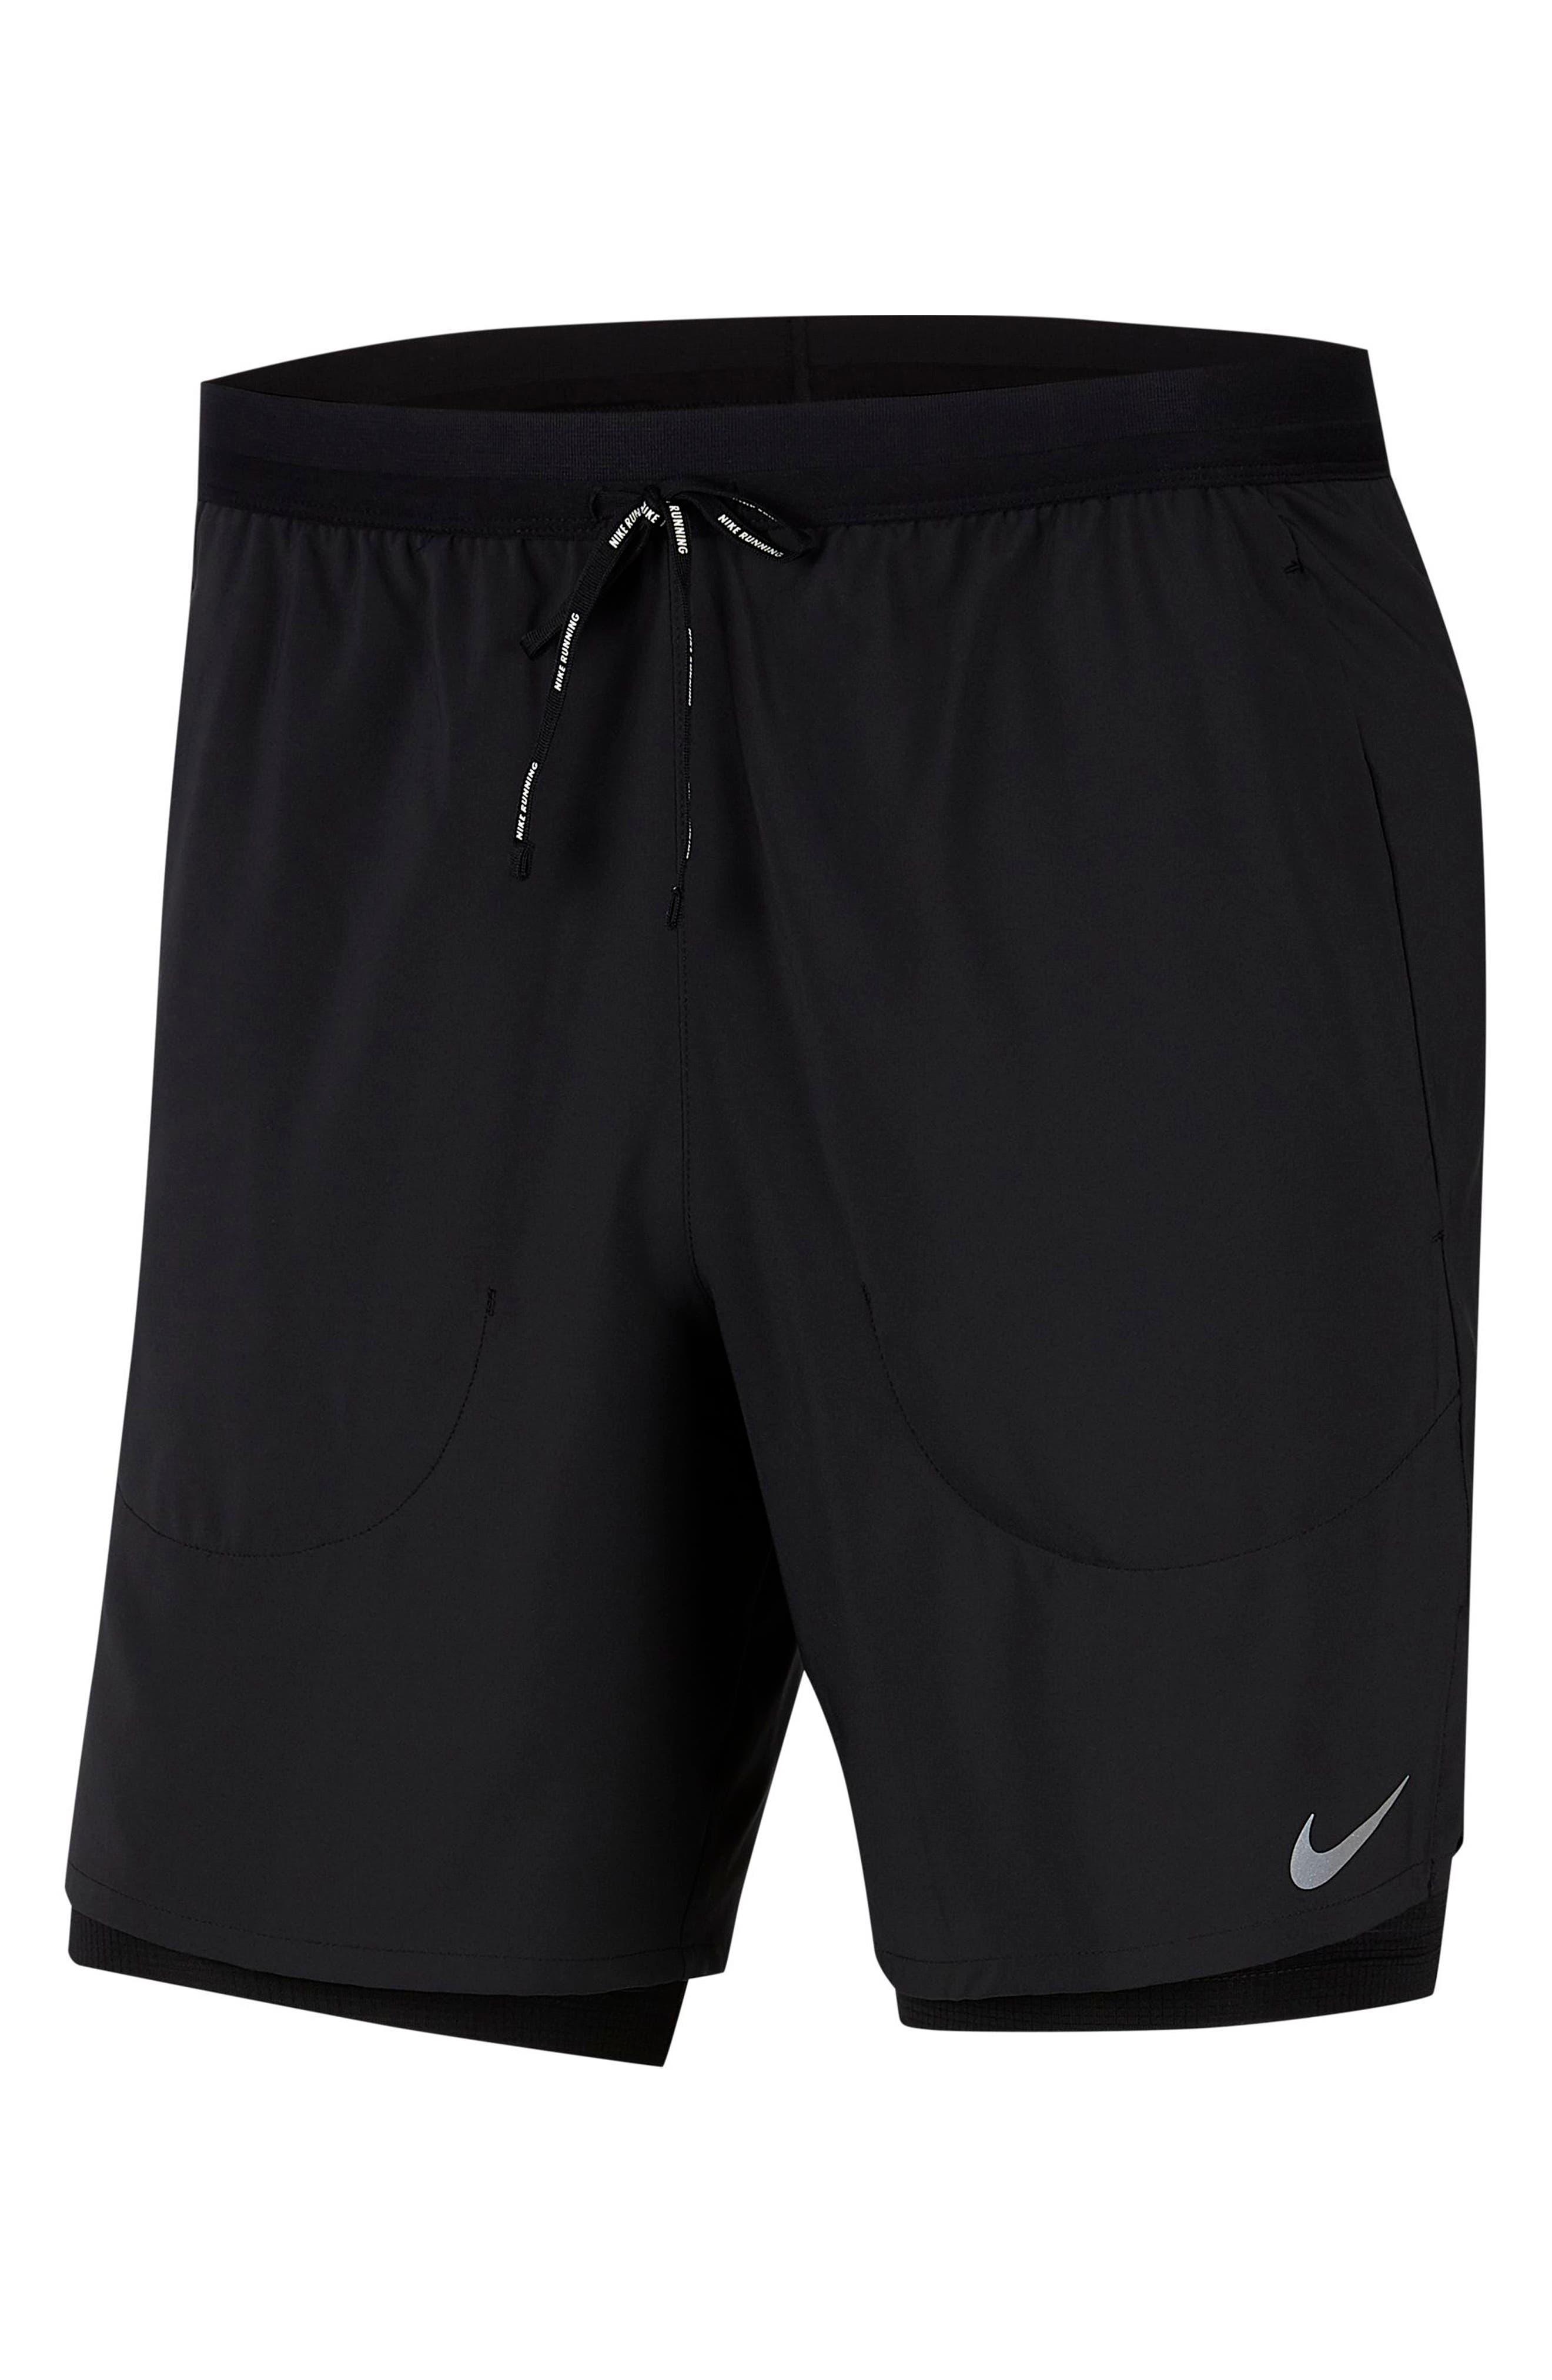 Men's Nike Flex Stride Performance Athletic Shorts